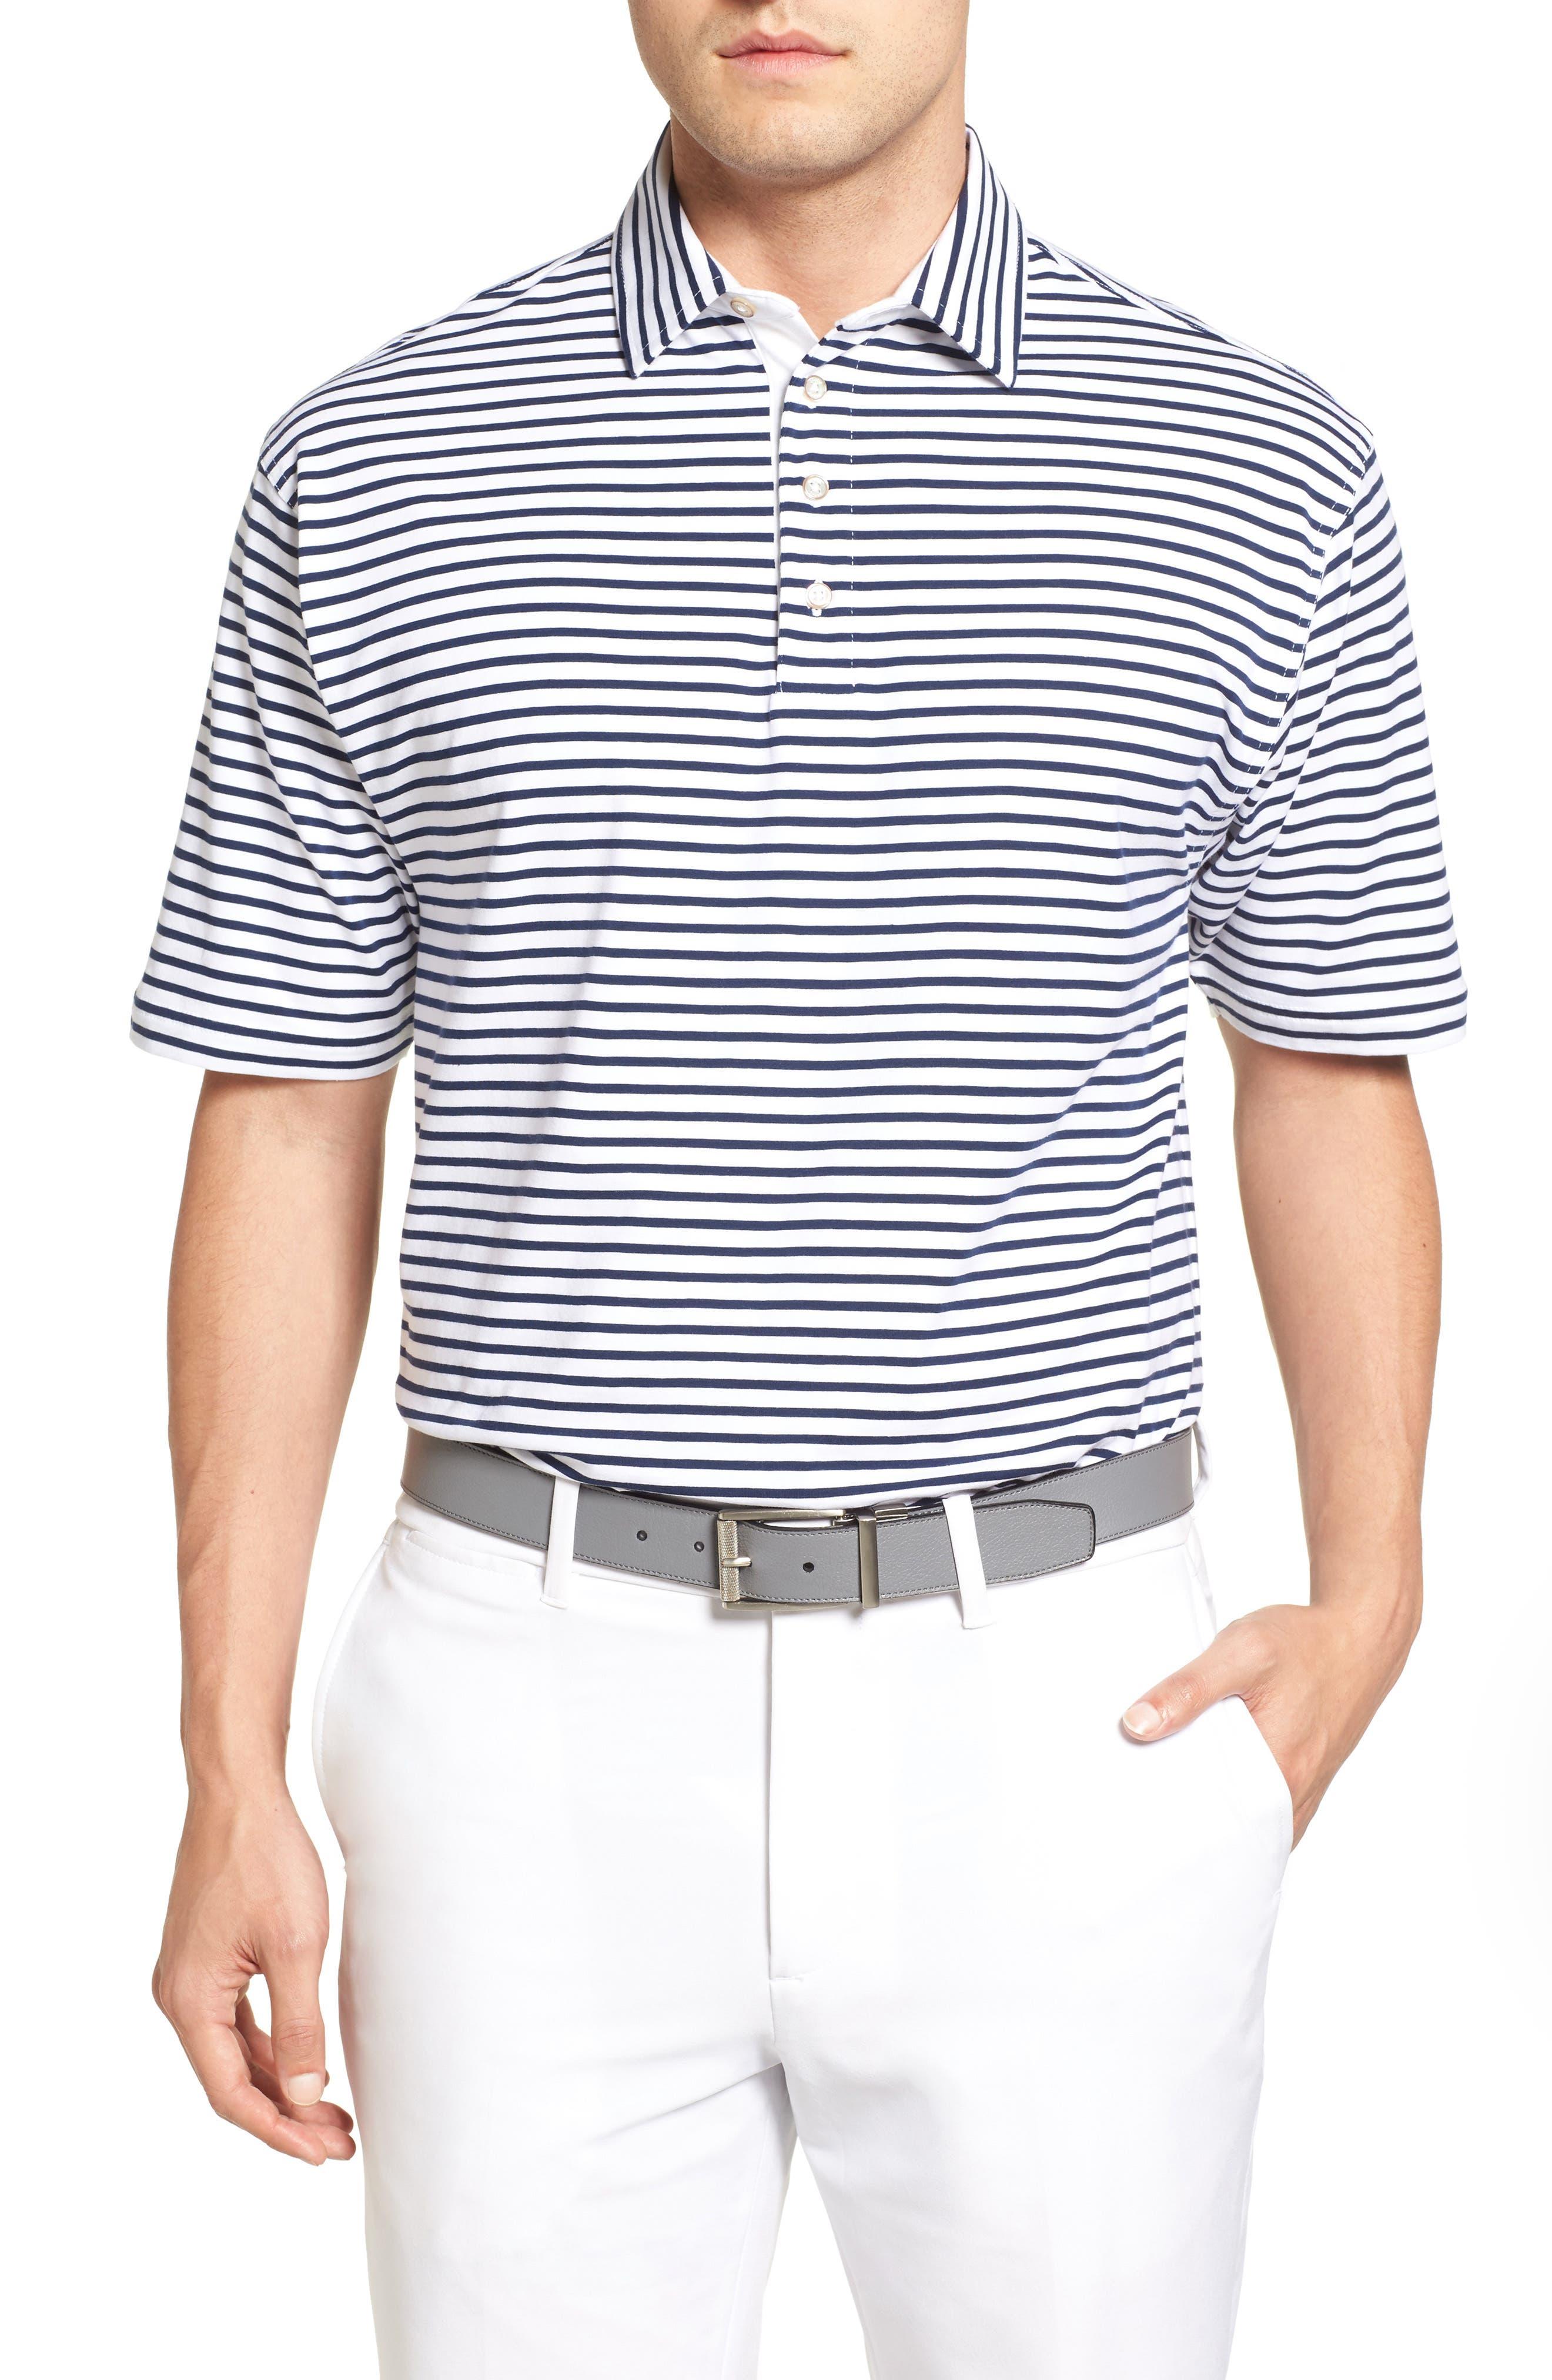 Bobby Jones Liquid Cotton Feed Stripe Polo